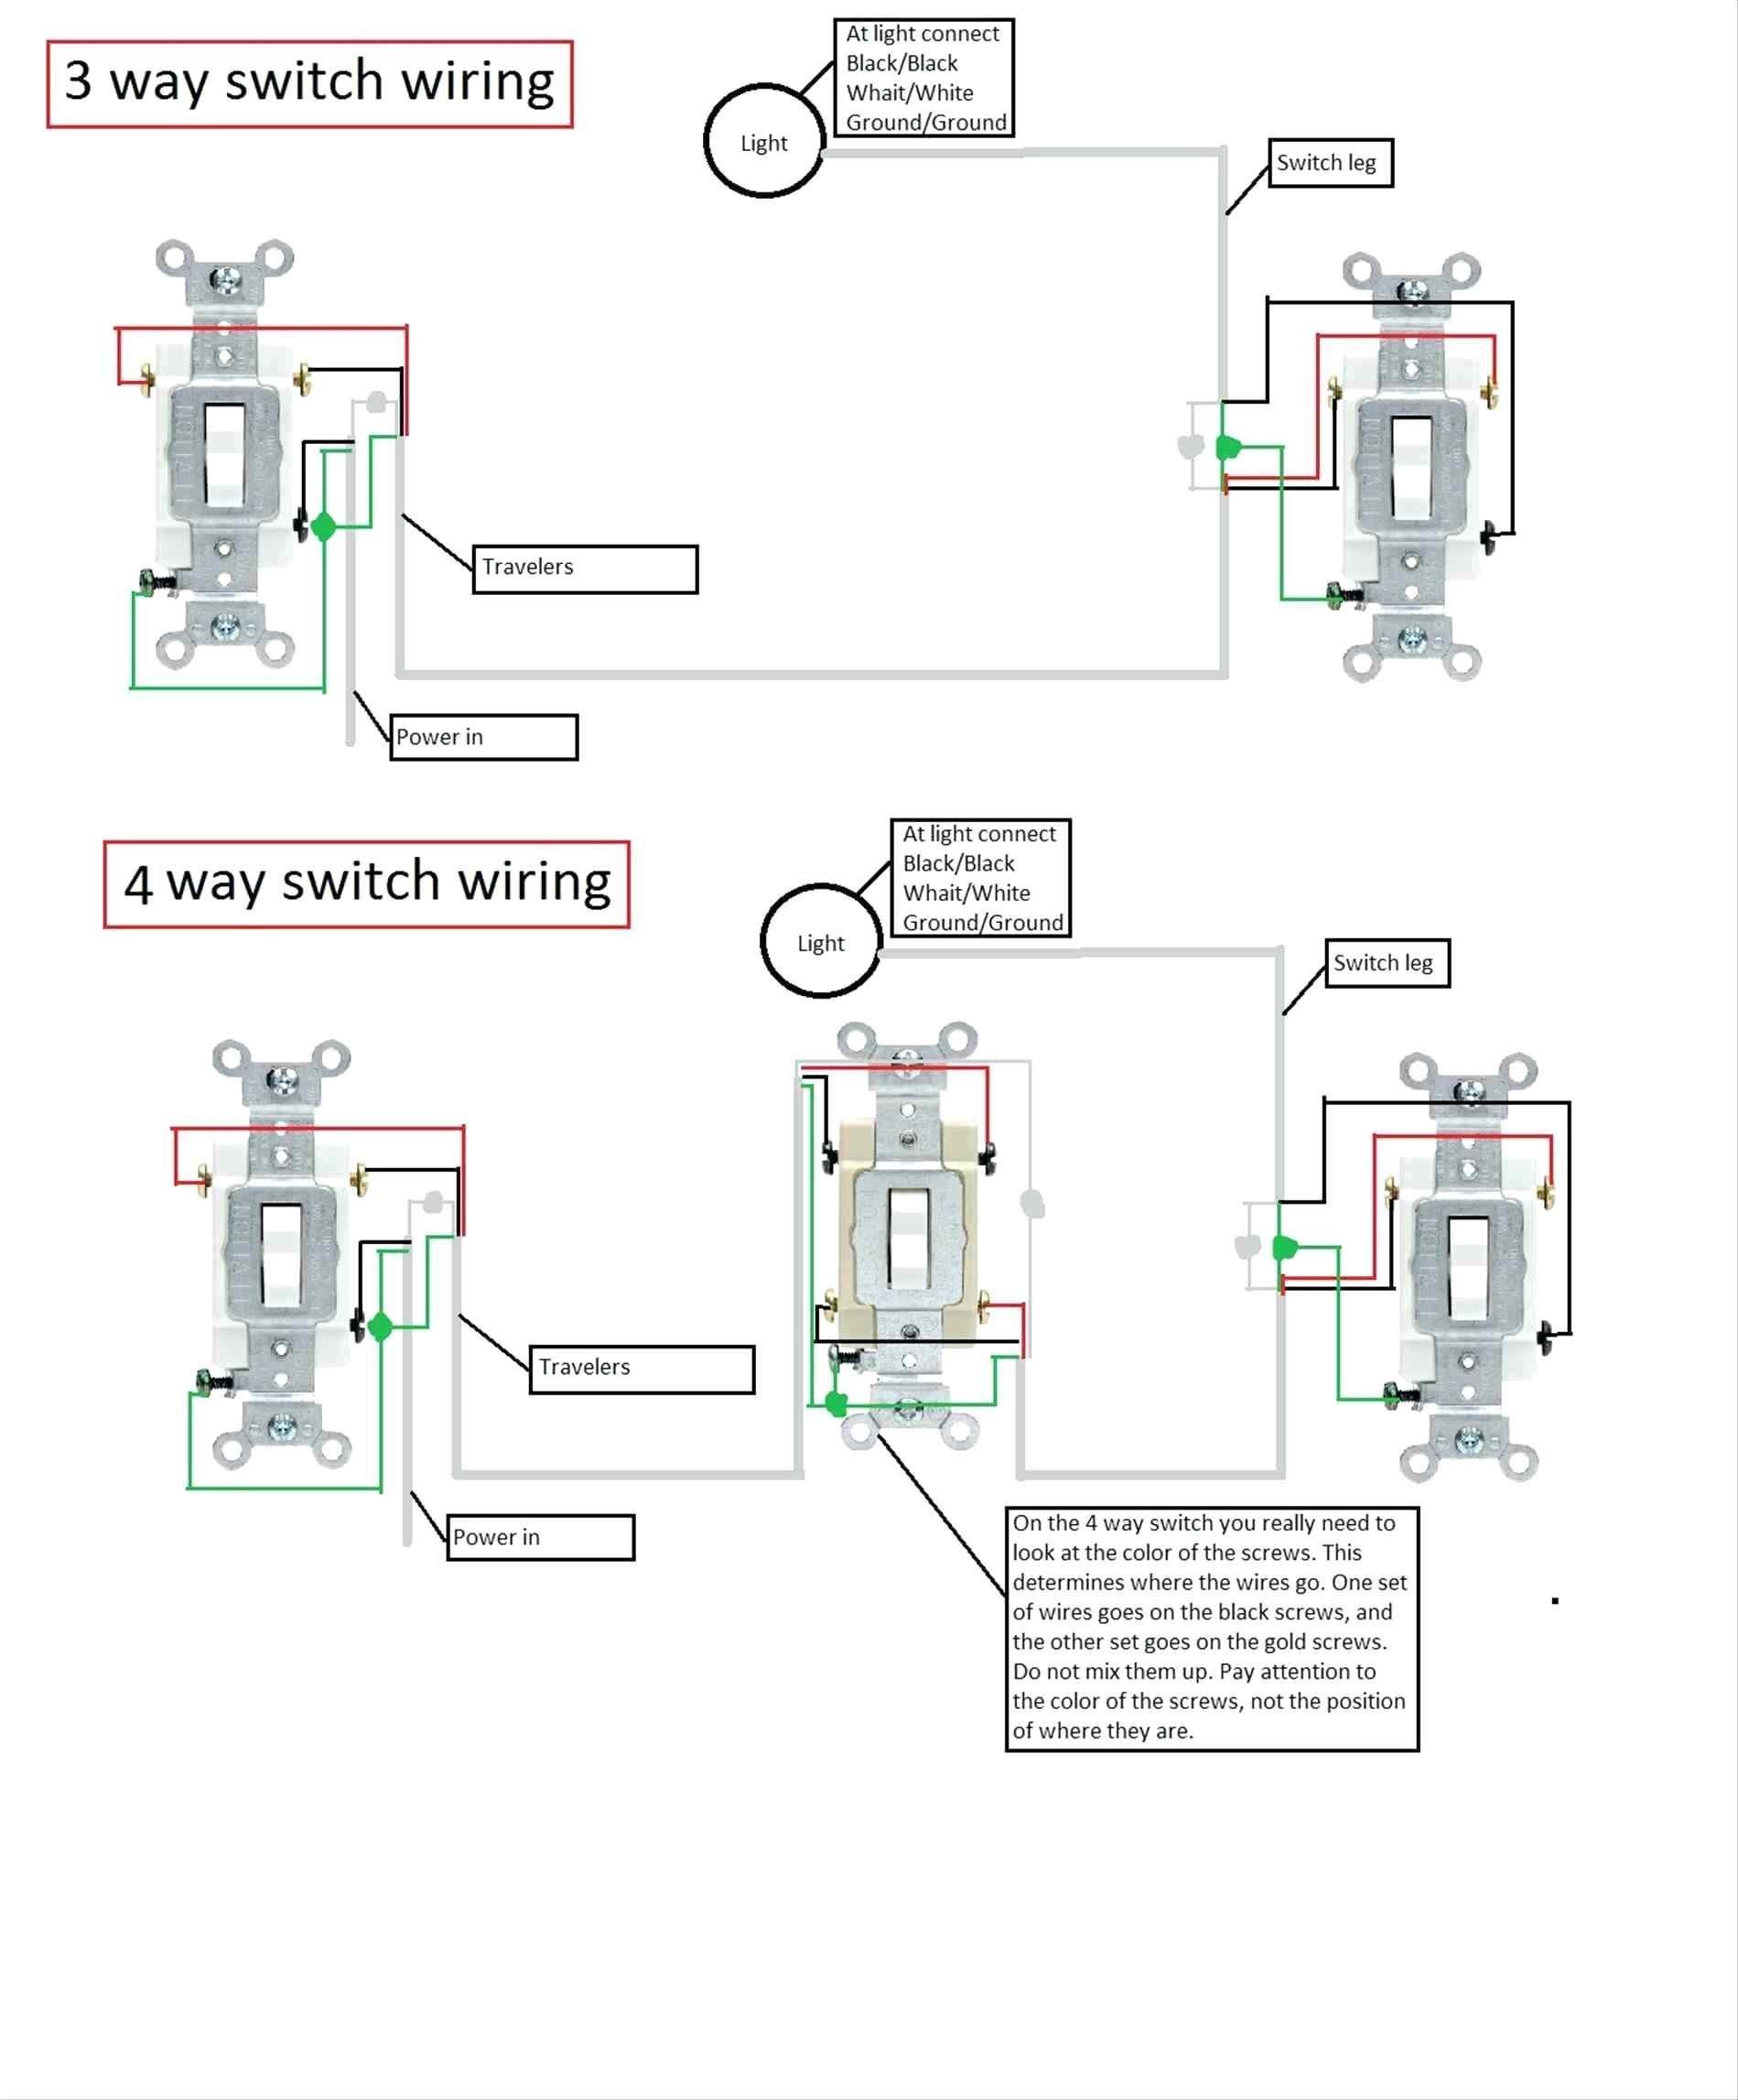 Surprising Sprinkler Wiring Diagram Also Switch Leg Wiring Diagram Wiring Wiring Cloud Domeilariaidewilluminateatxorg